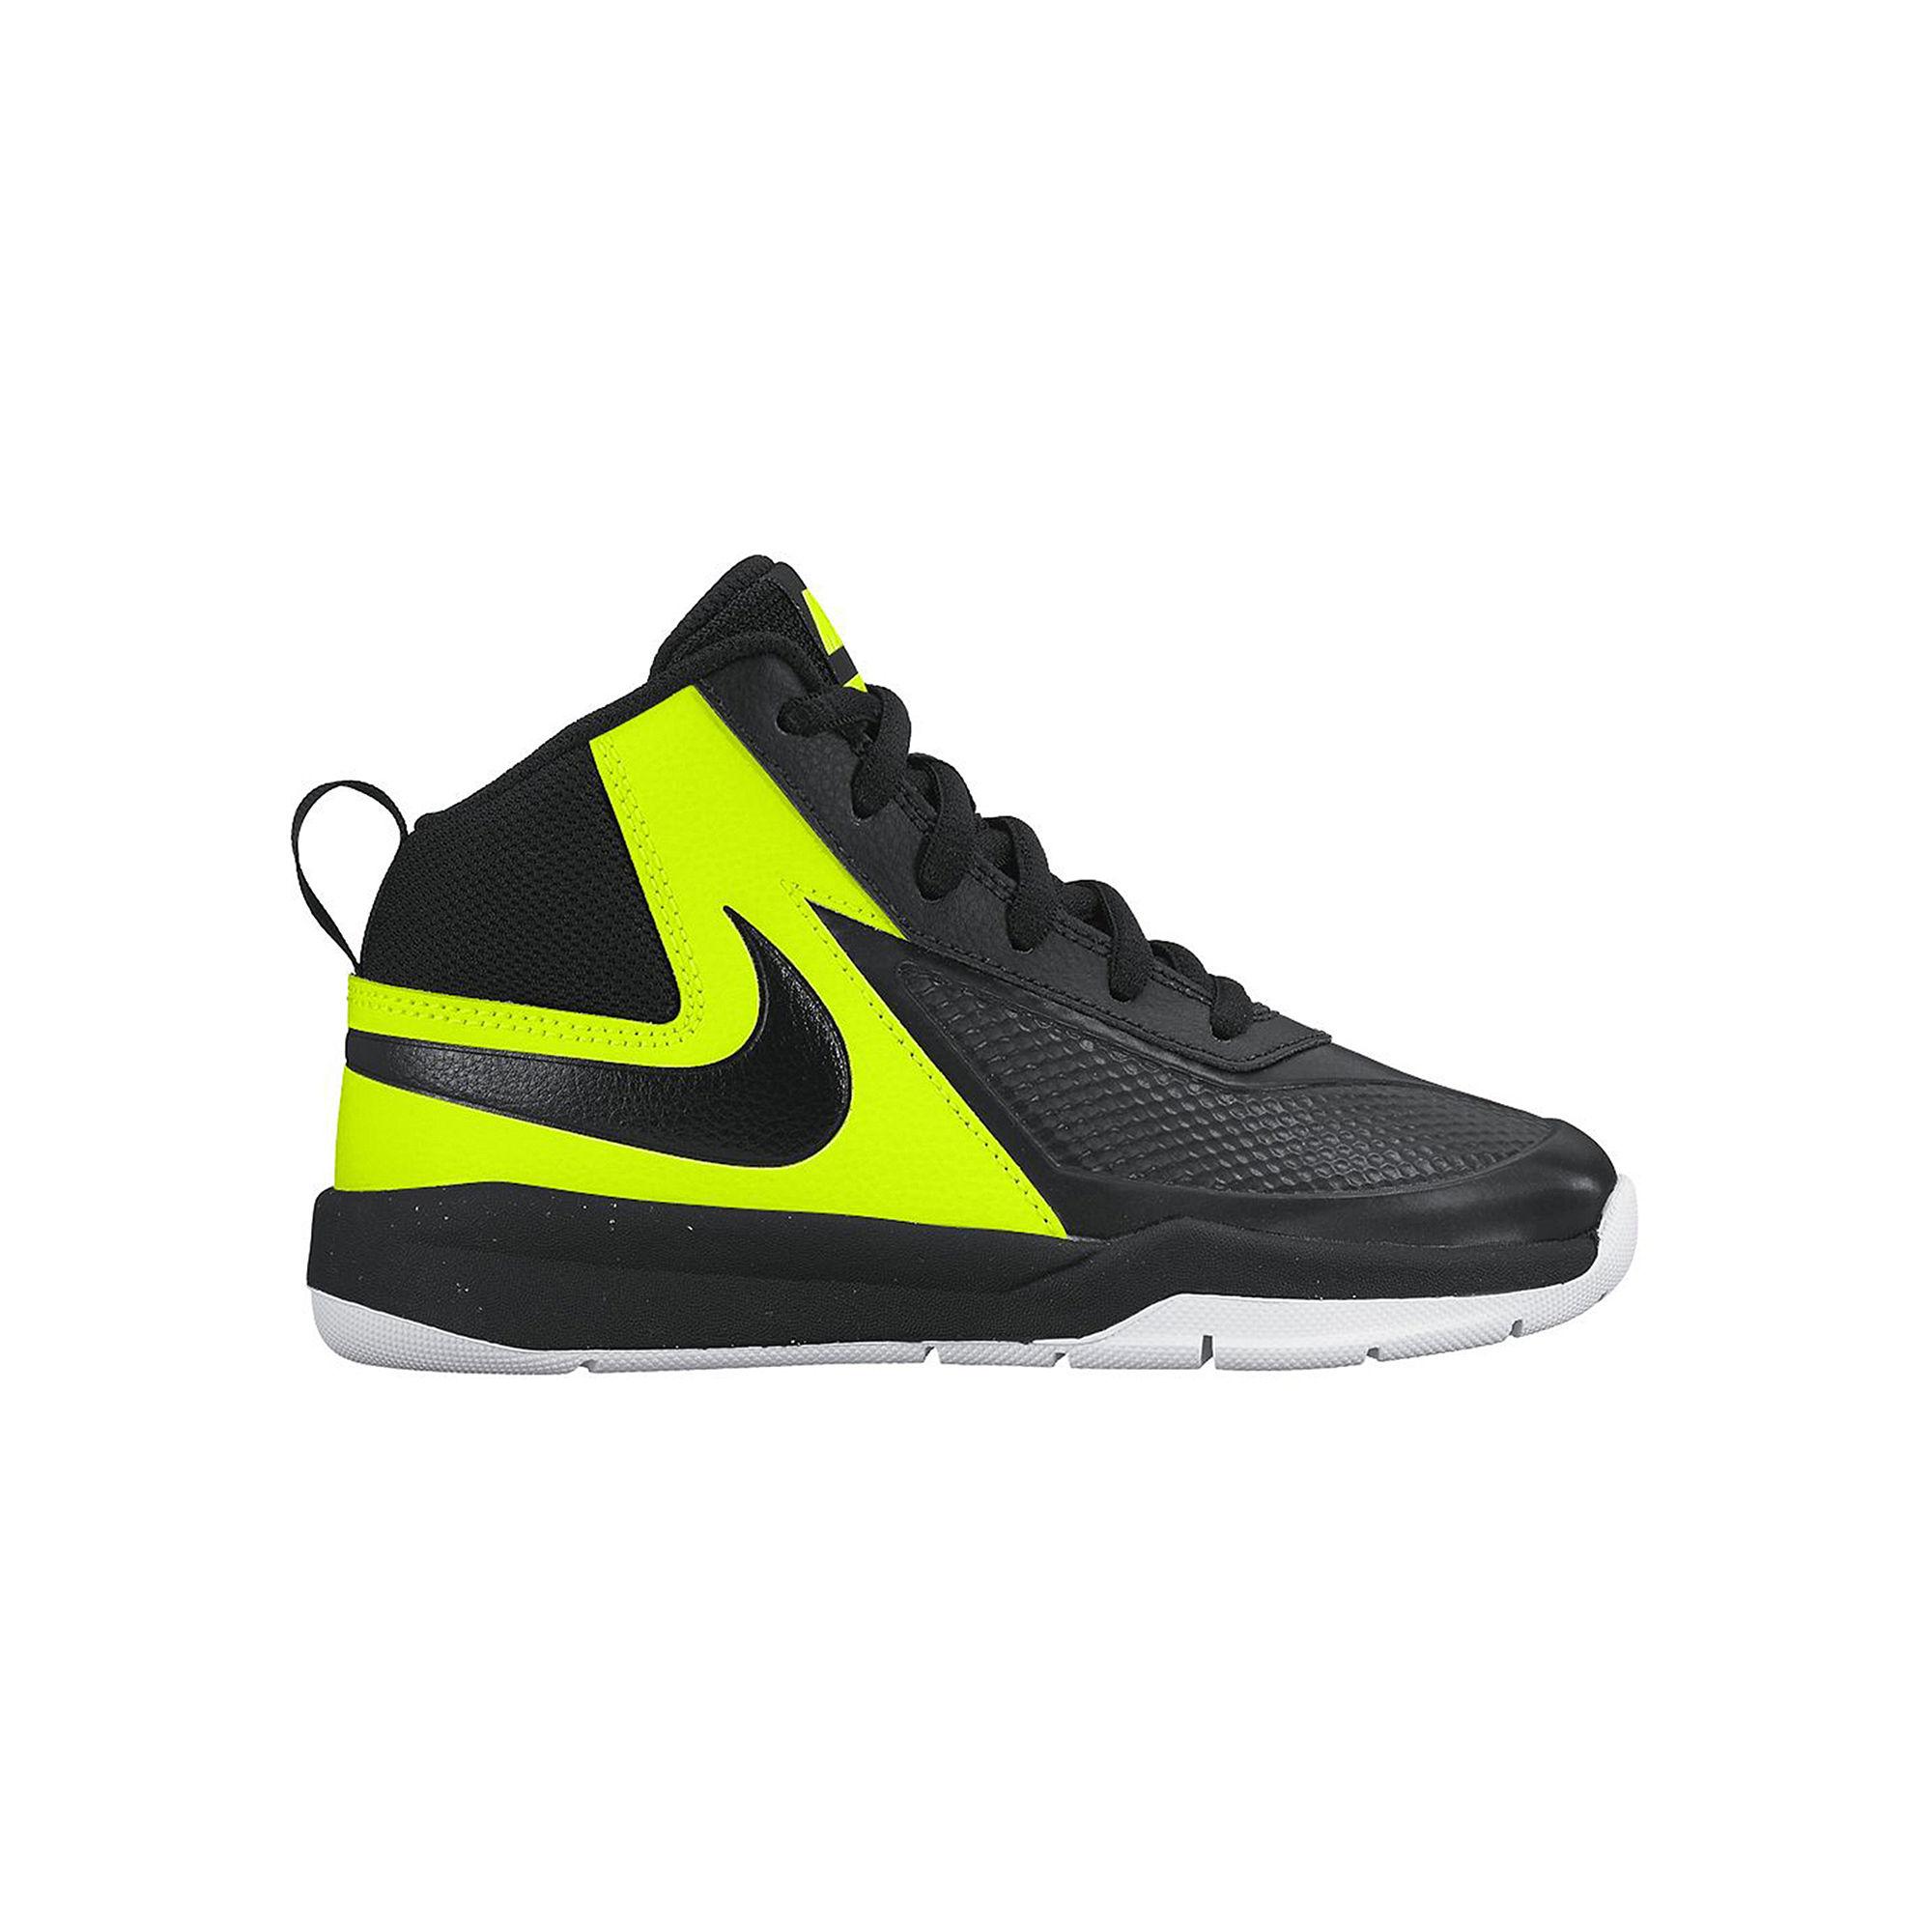 UPC 888409436046 product image for Nike Team Hustle D7 Boys Basketball Shoes  - Little Kids/